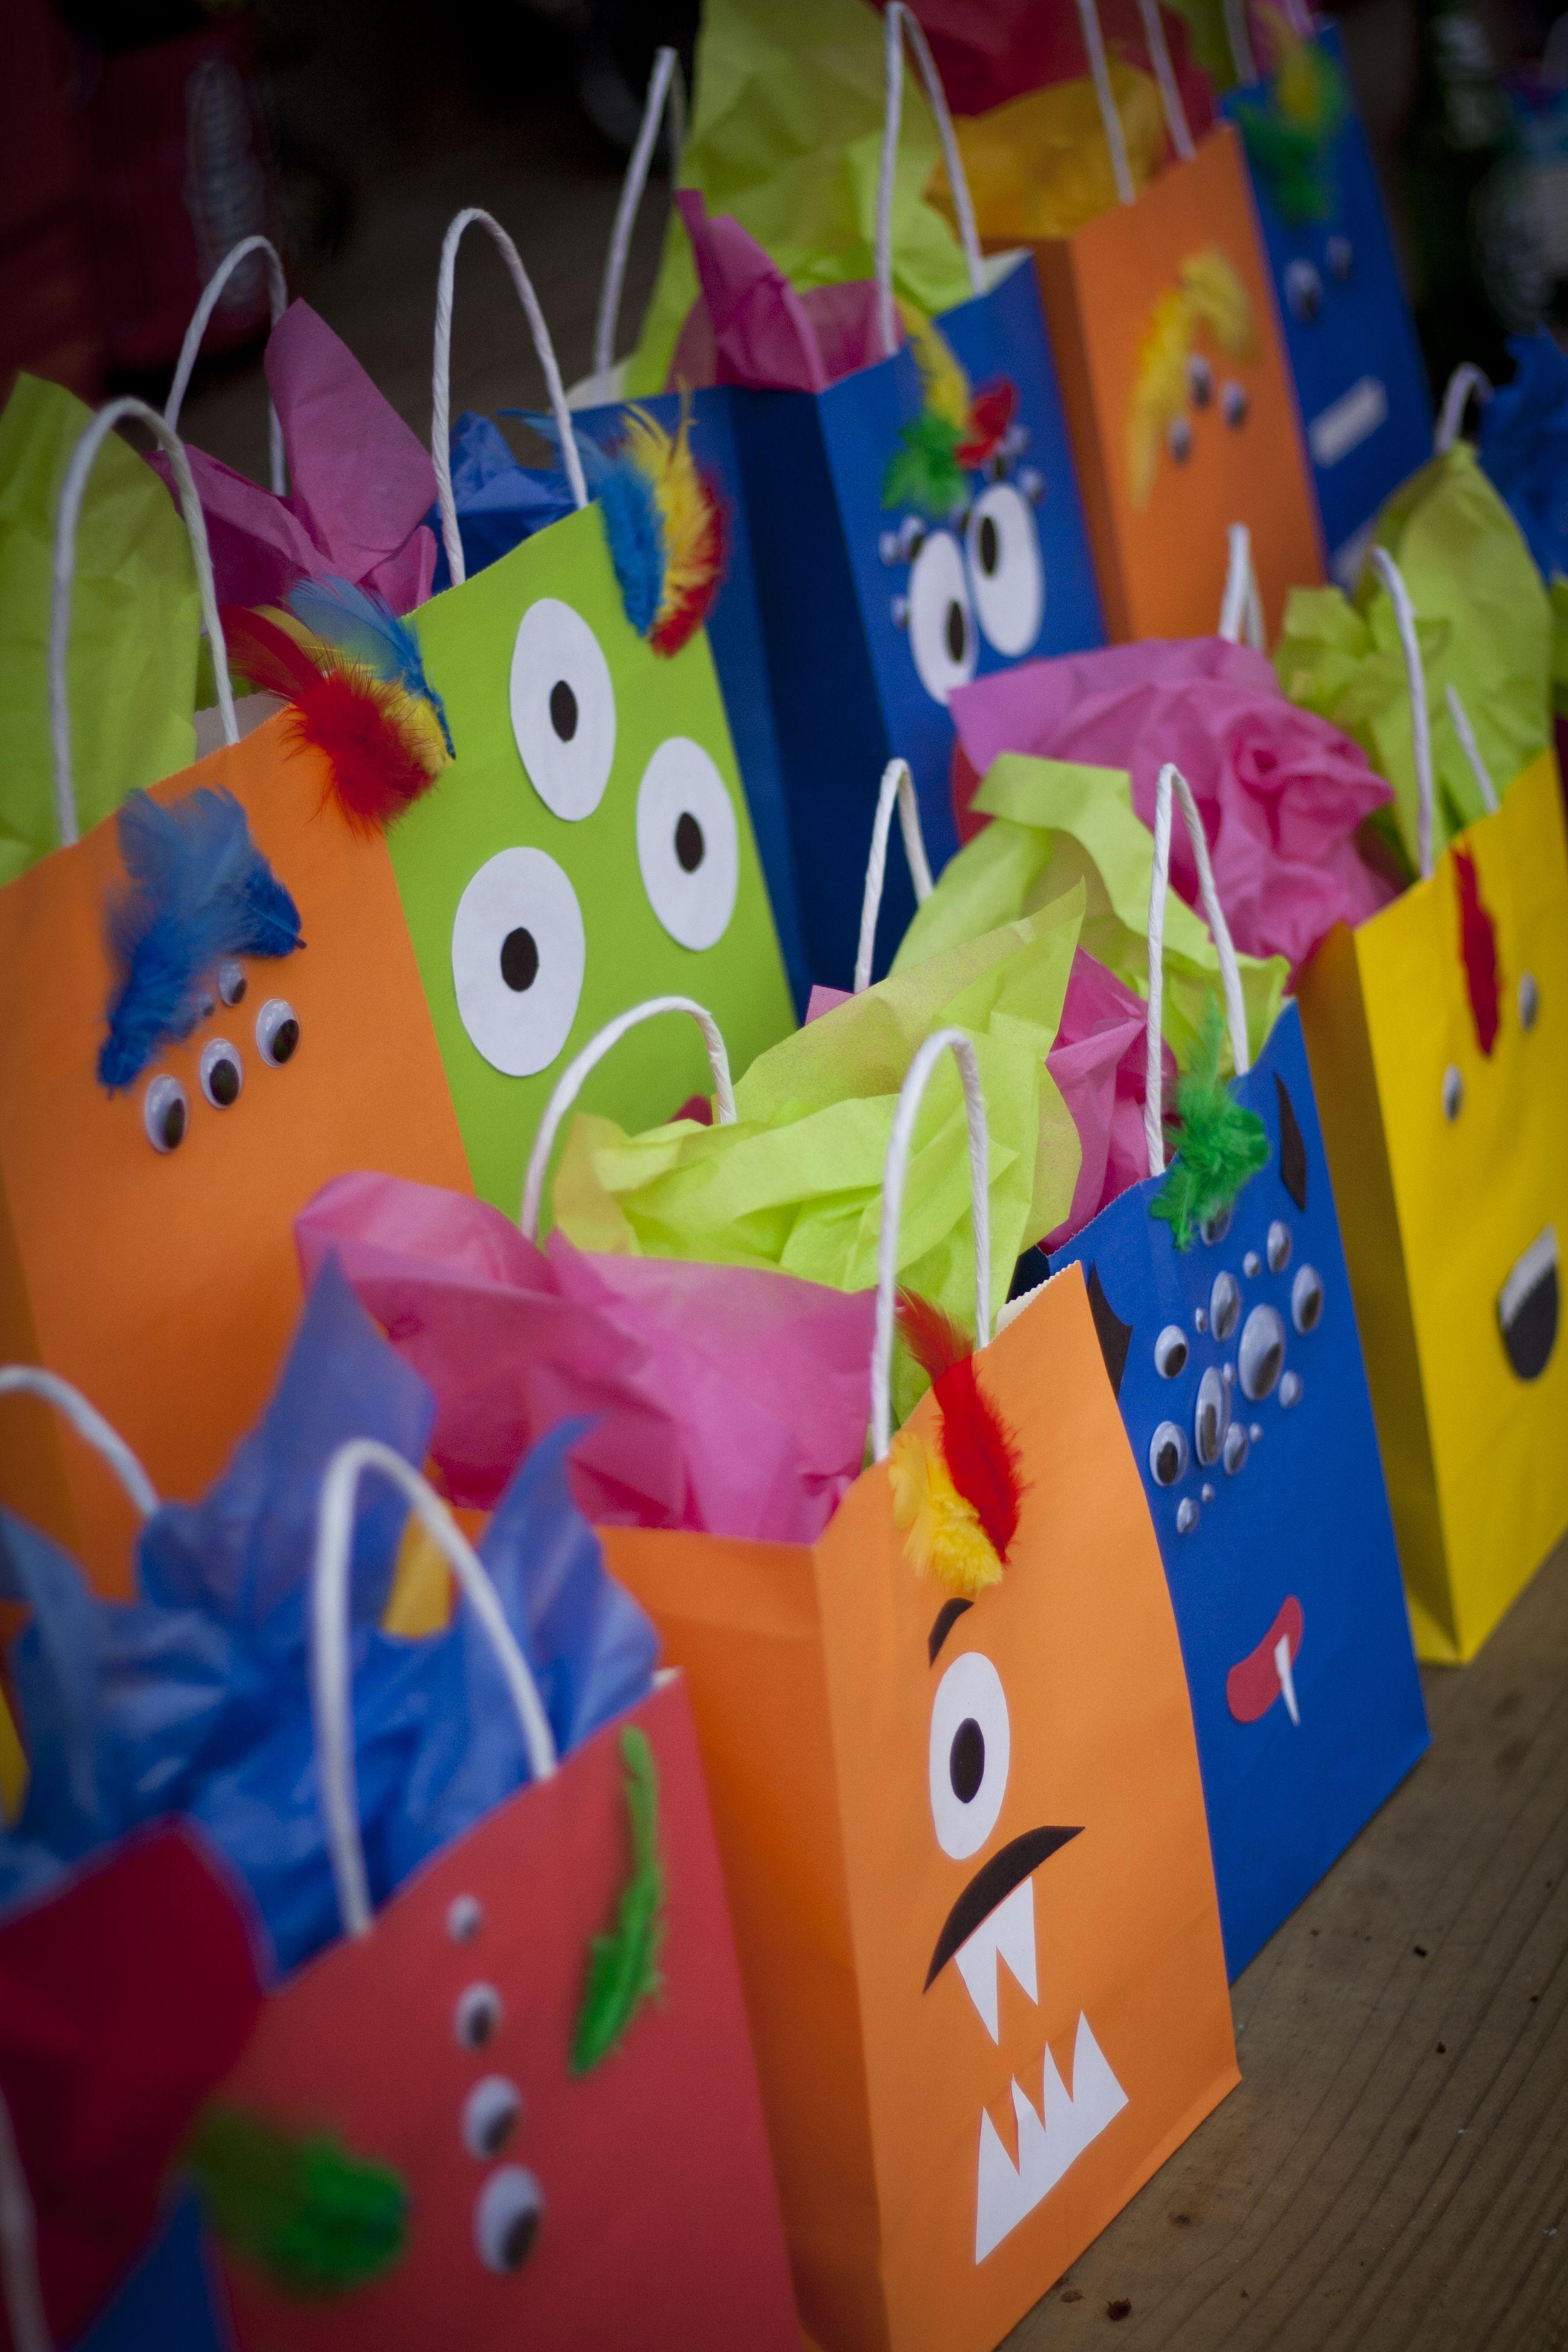 Monster party favor bags Visit wwwfireblossomcandlecom for